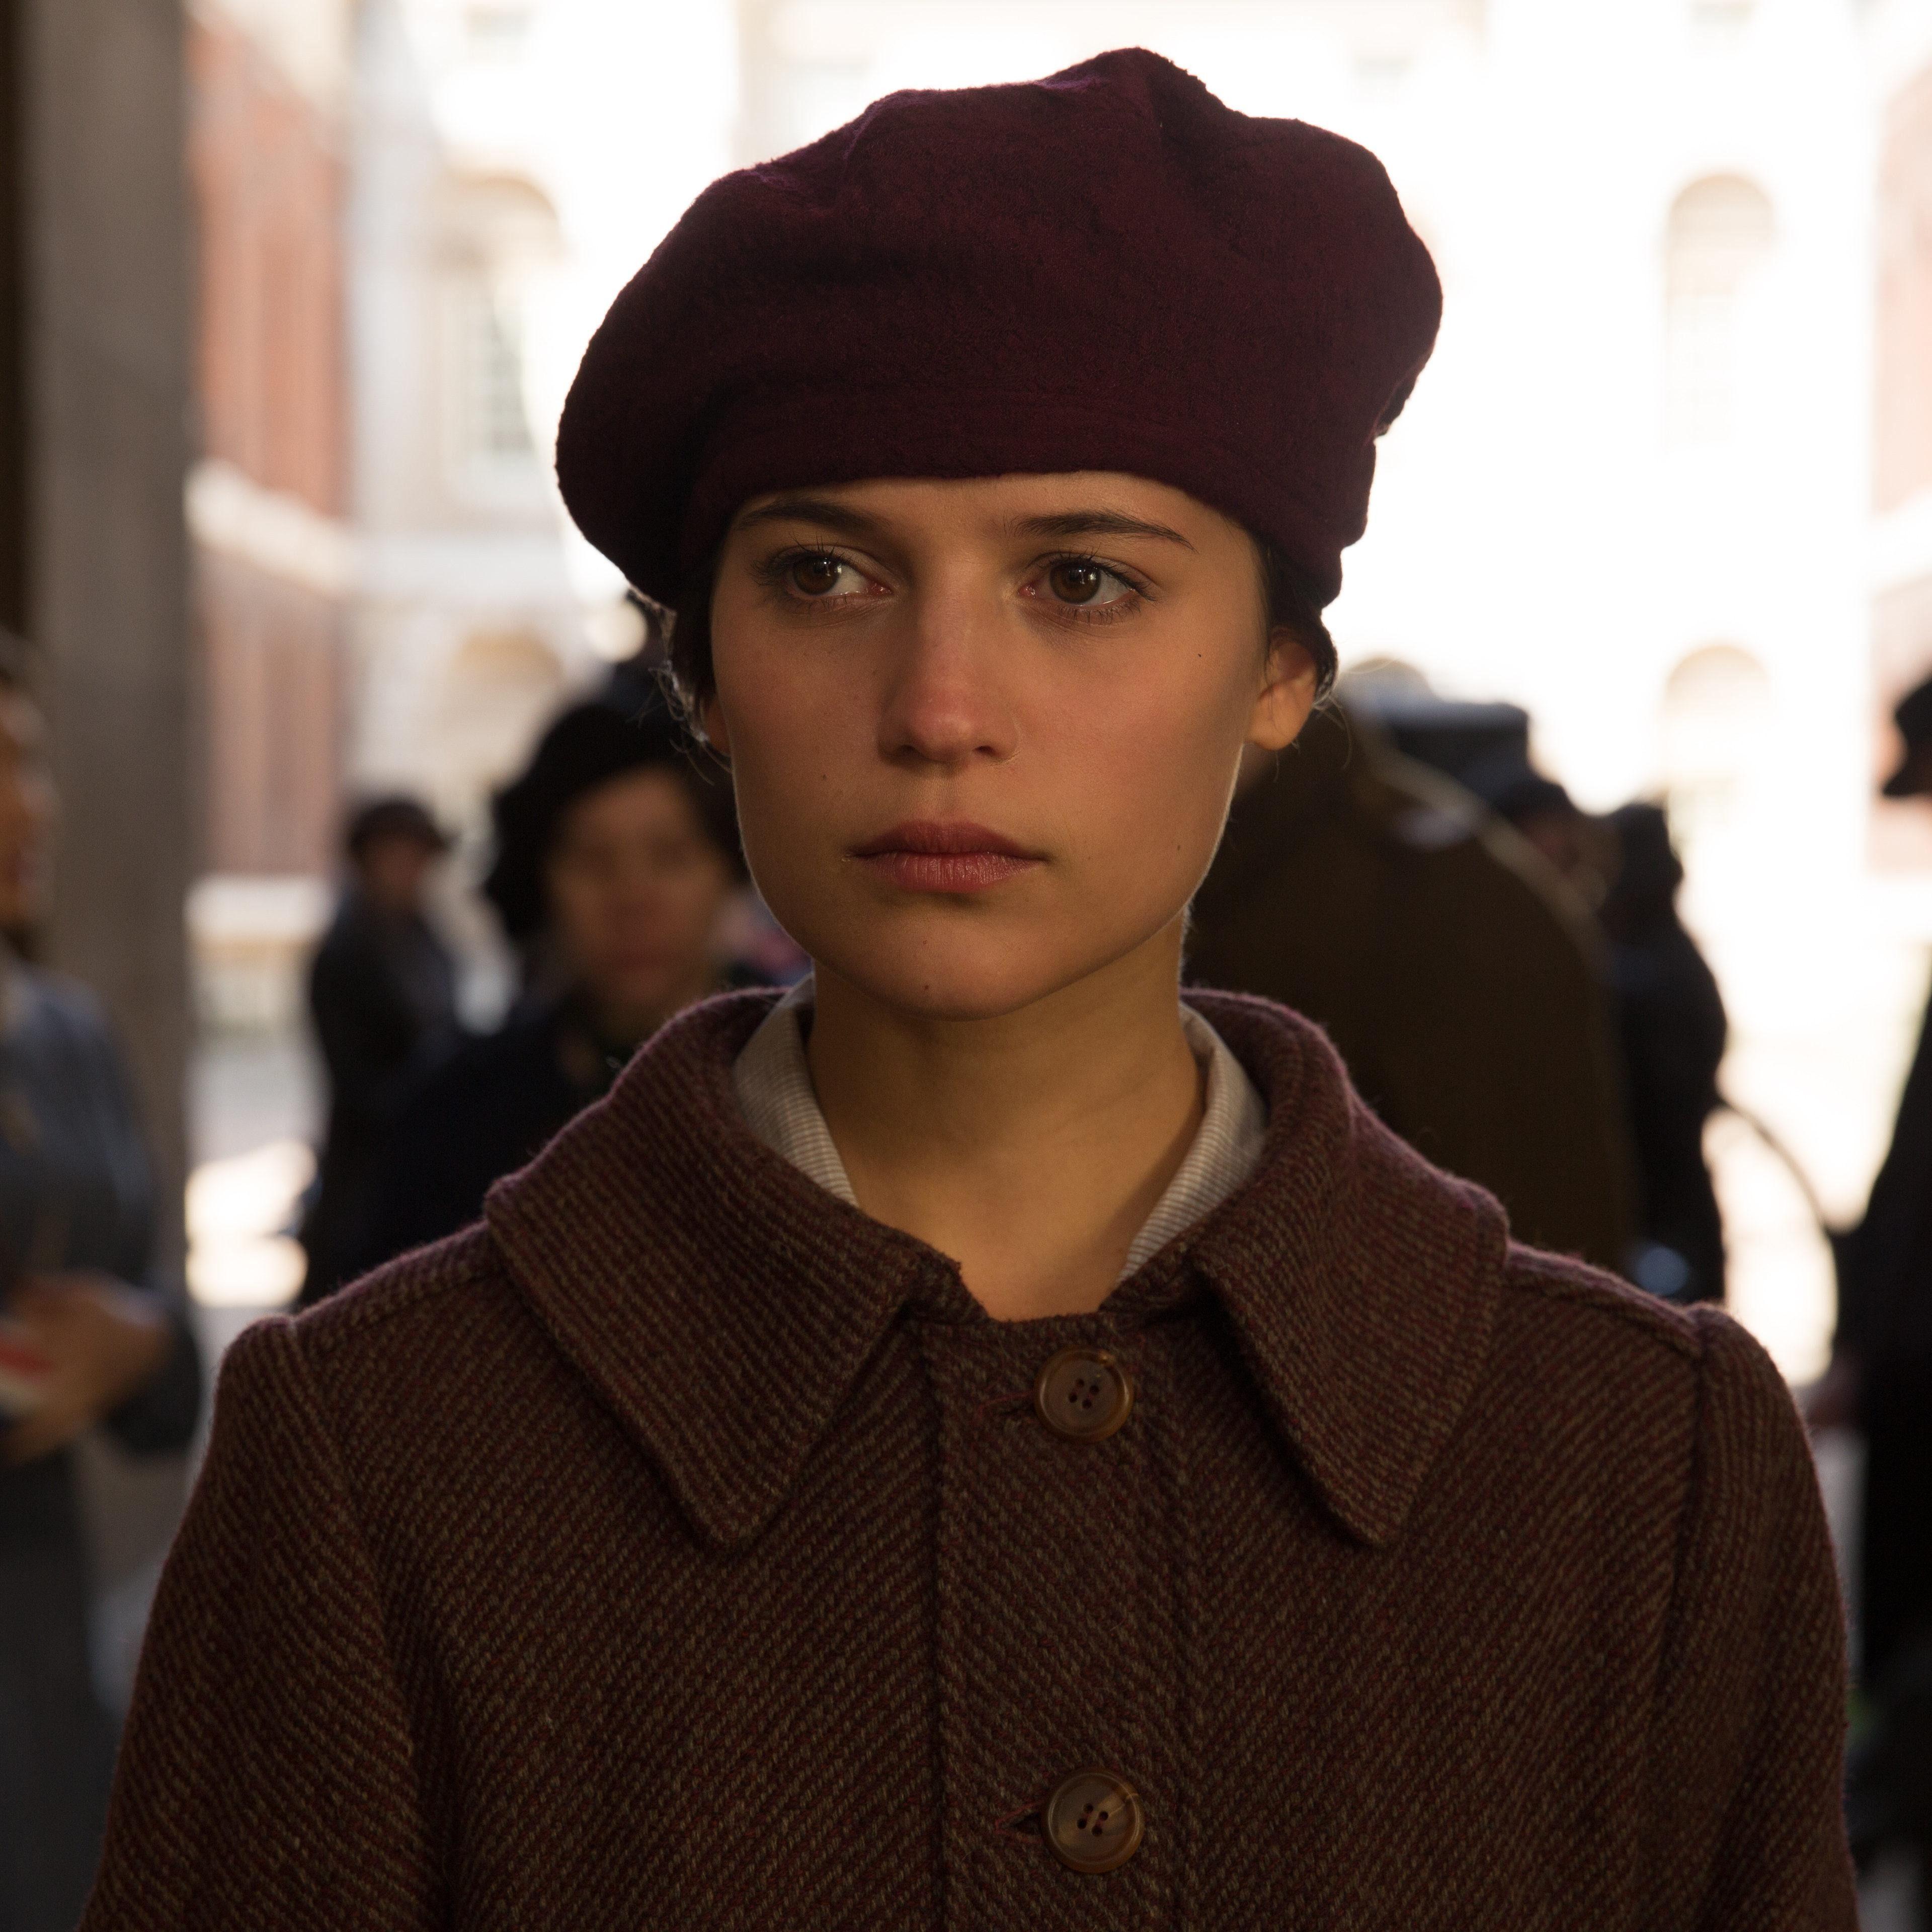 brittain 米兰达·理查森 饰:洛里默小姐 miss lorimer 安娜·钱斯勒